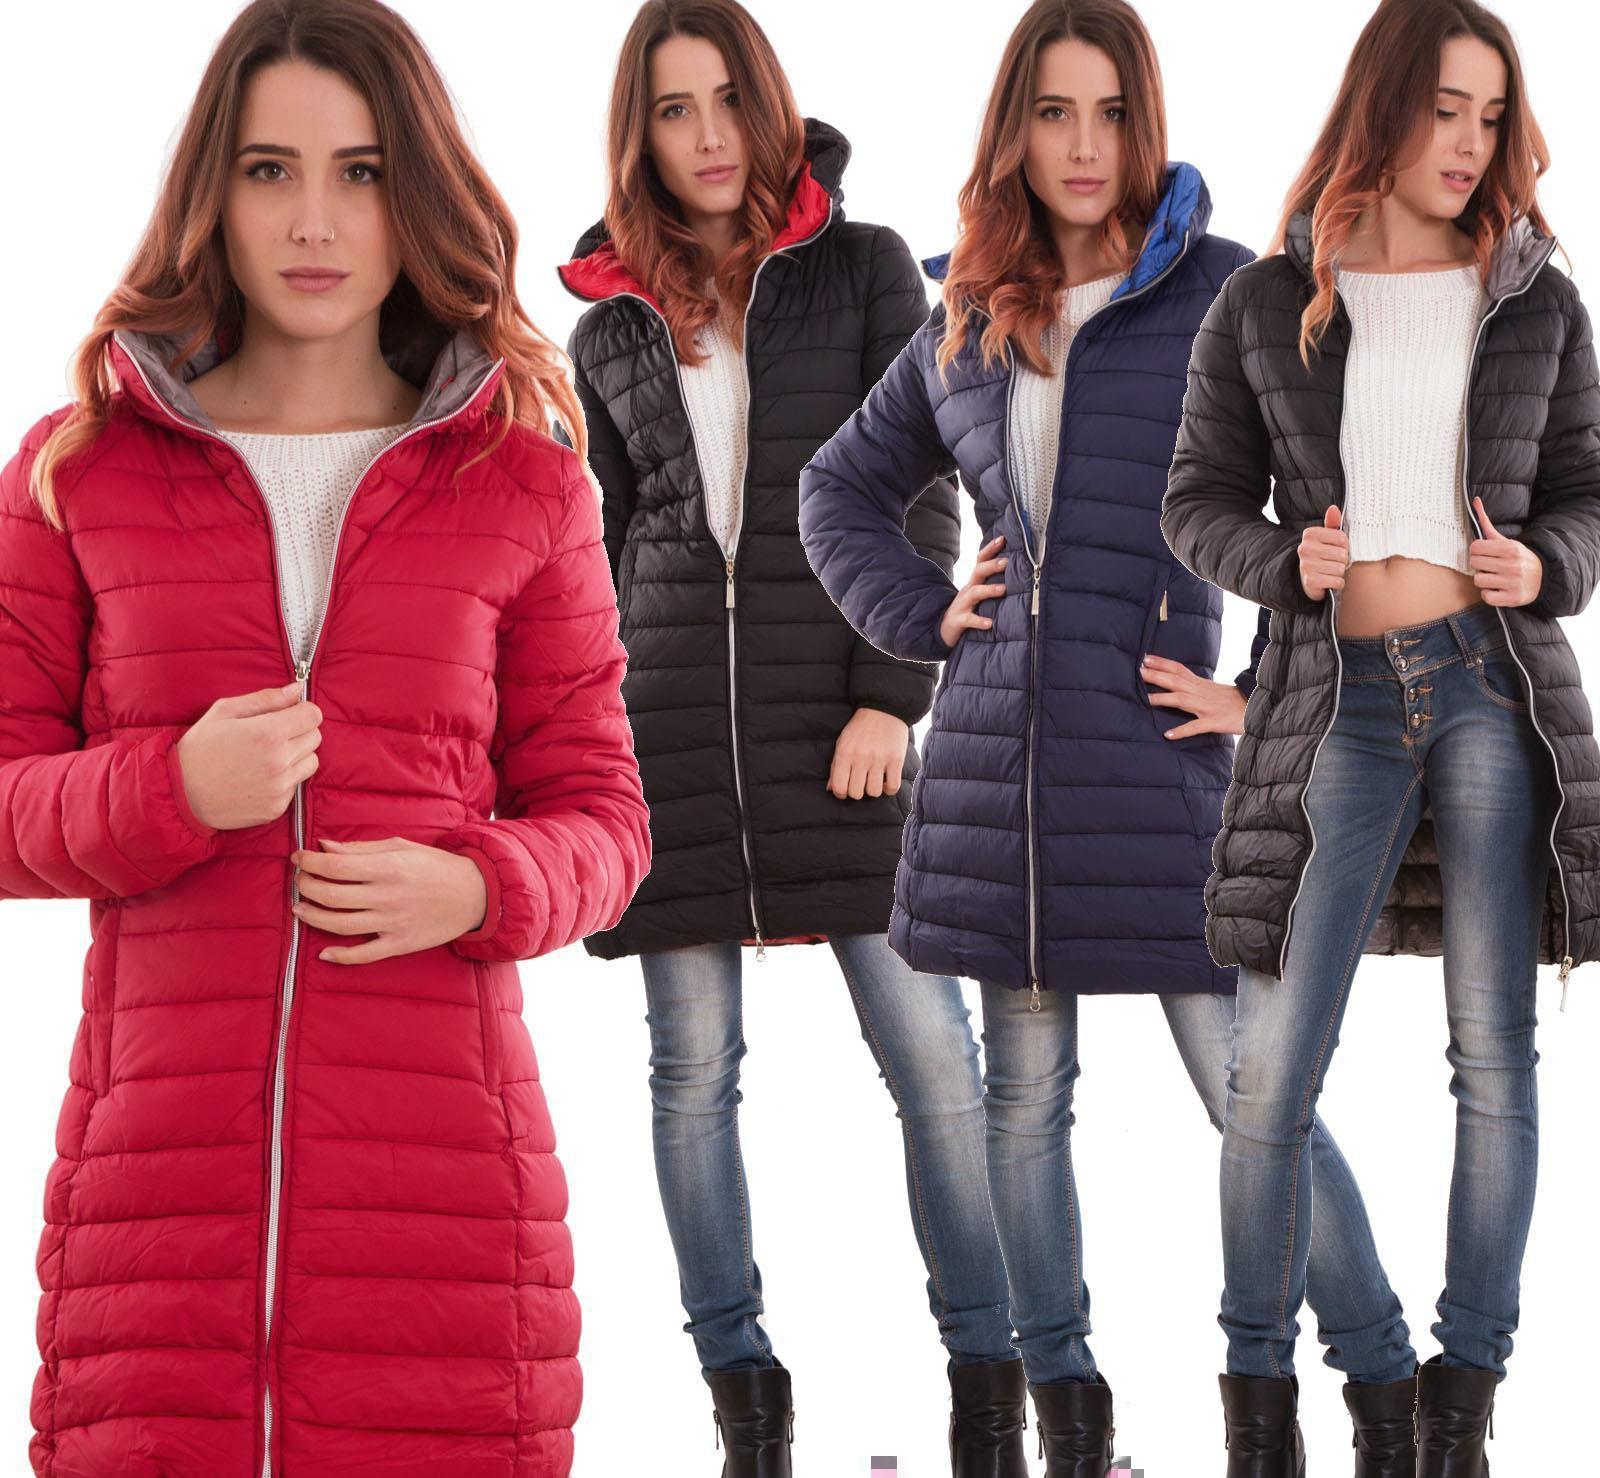 ZOGAA Long section winter coat Casual fashion Hooded coat women 2019 New women winter coat 4 colors puffer jacket Warm   Parkas